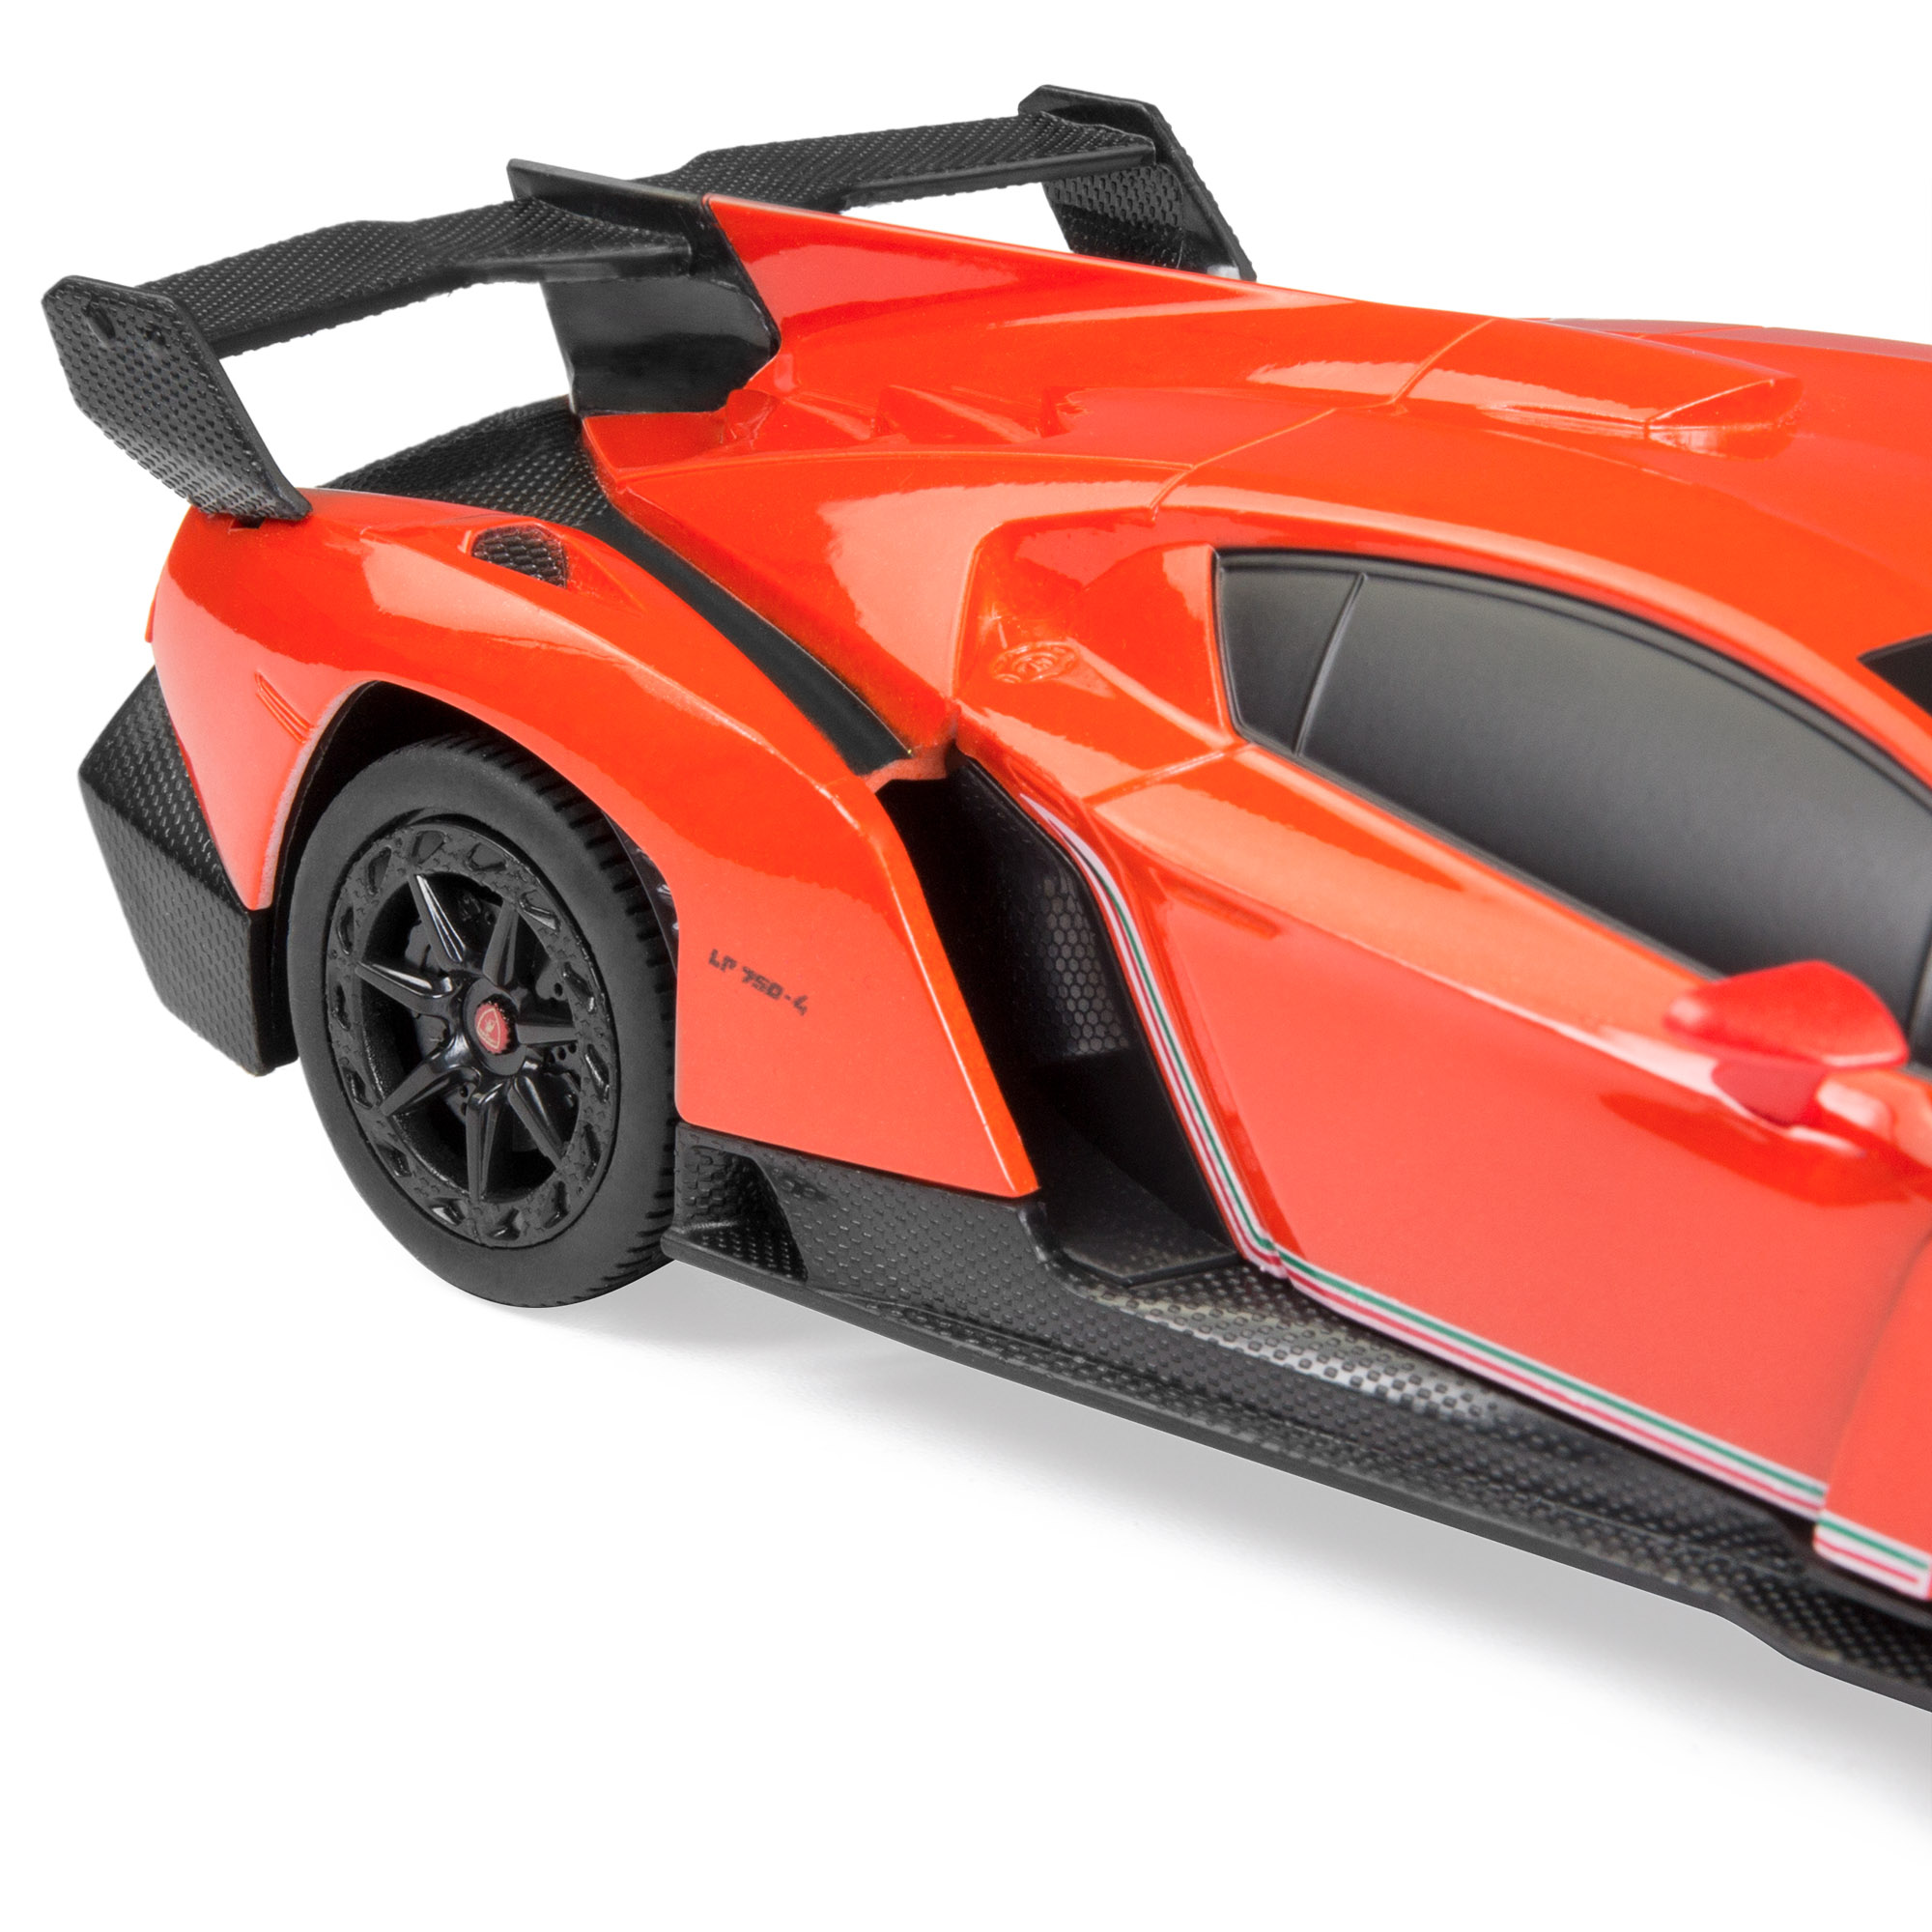 BCP-1-24-Kids-RC-Lamborghini-Veneno-Racing-Car-Toy-w-Lights-Shock-Suspension thumbnail 13